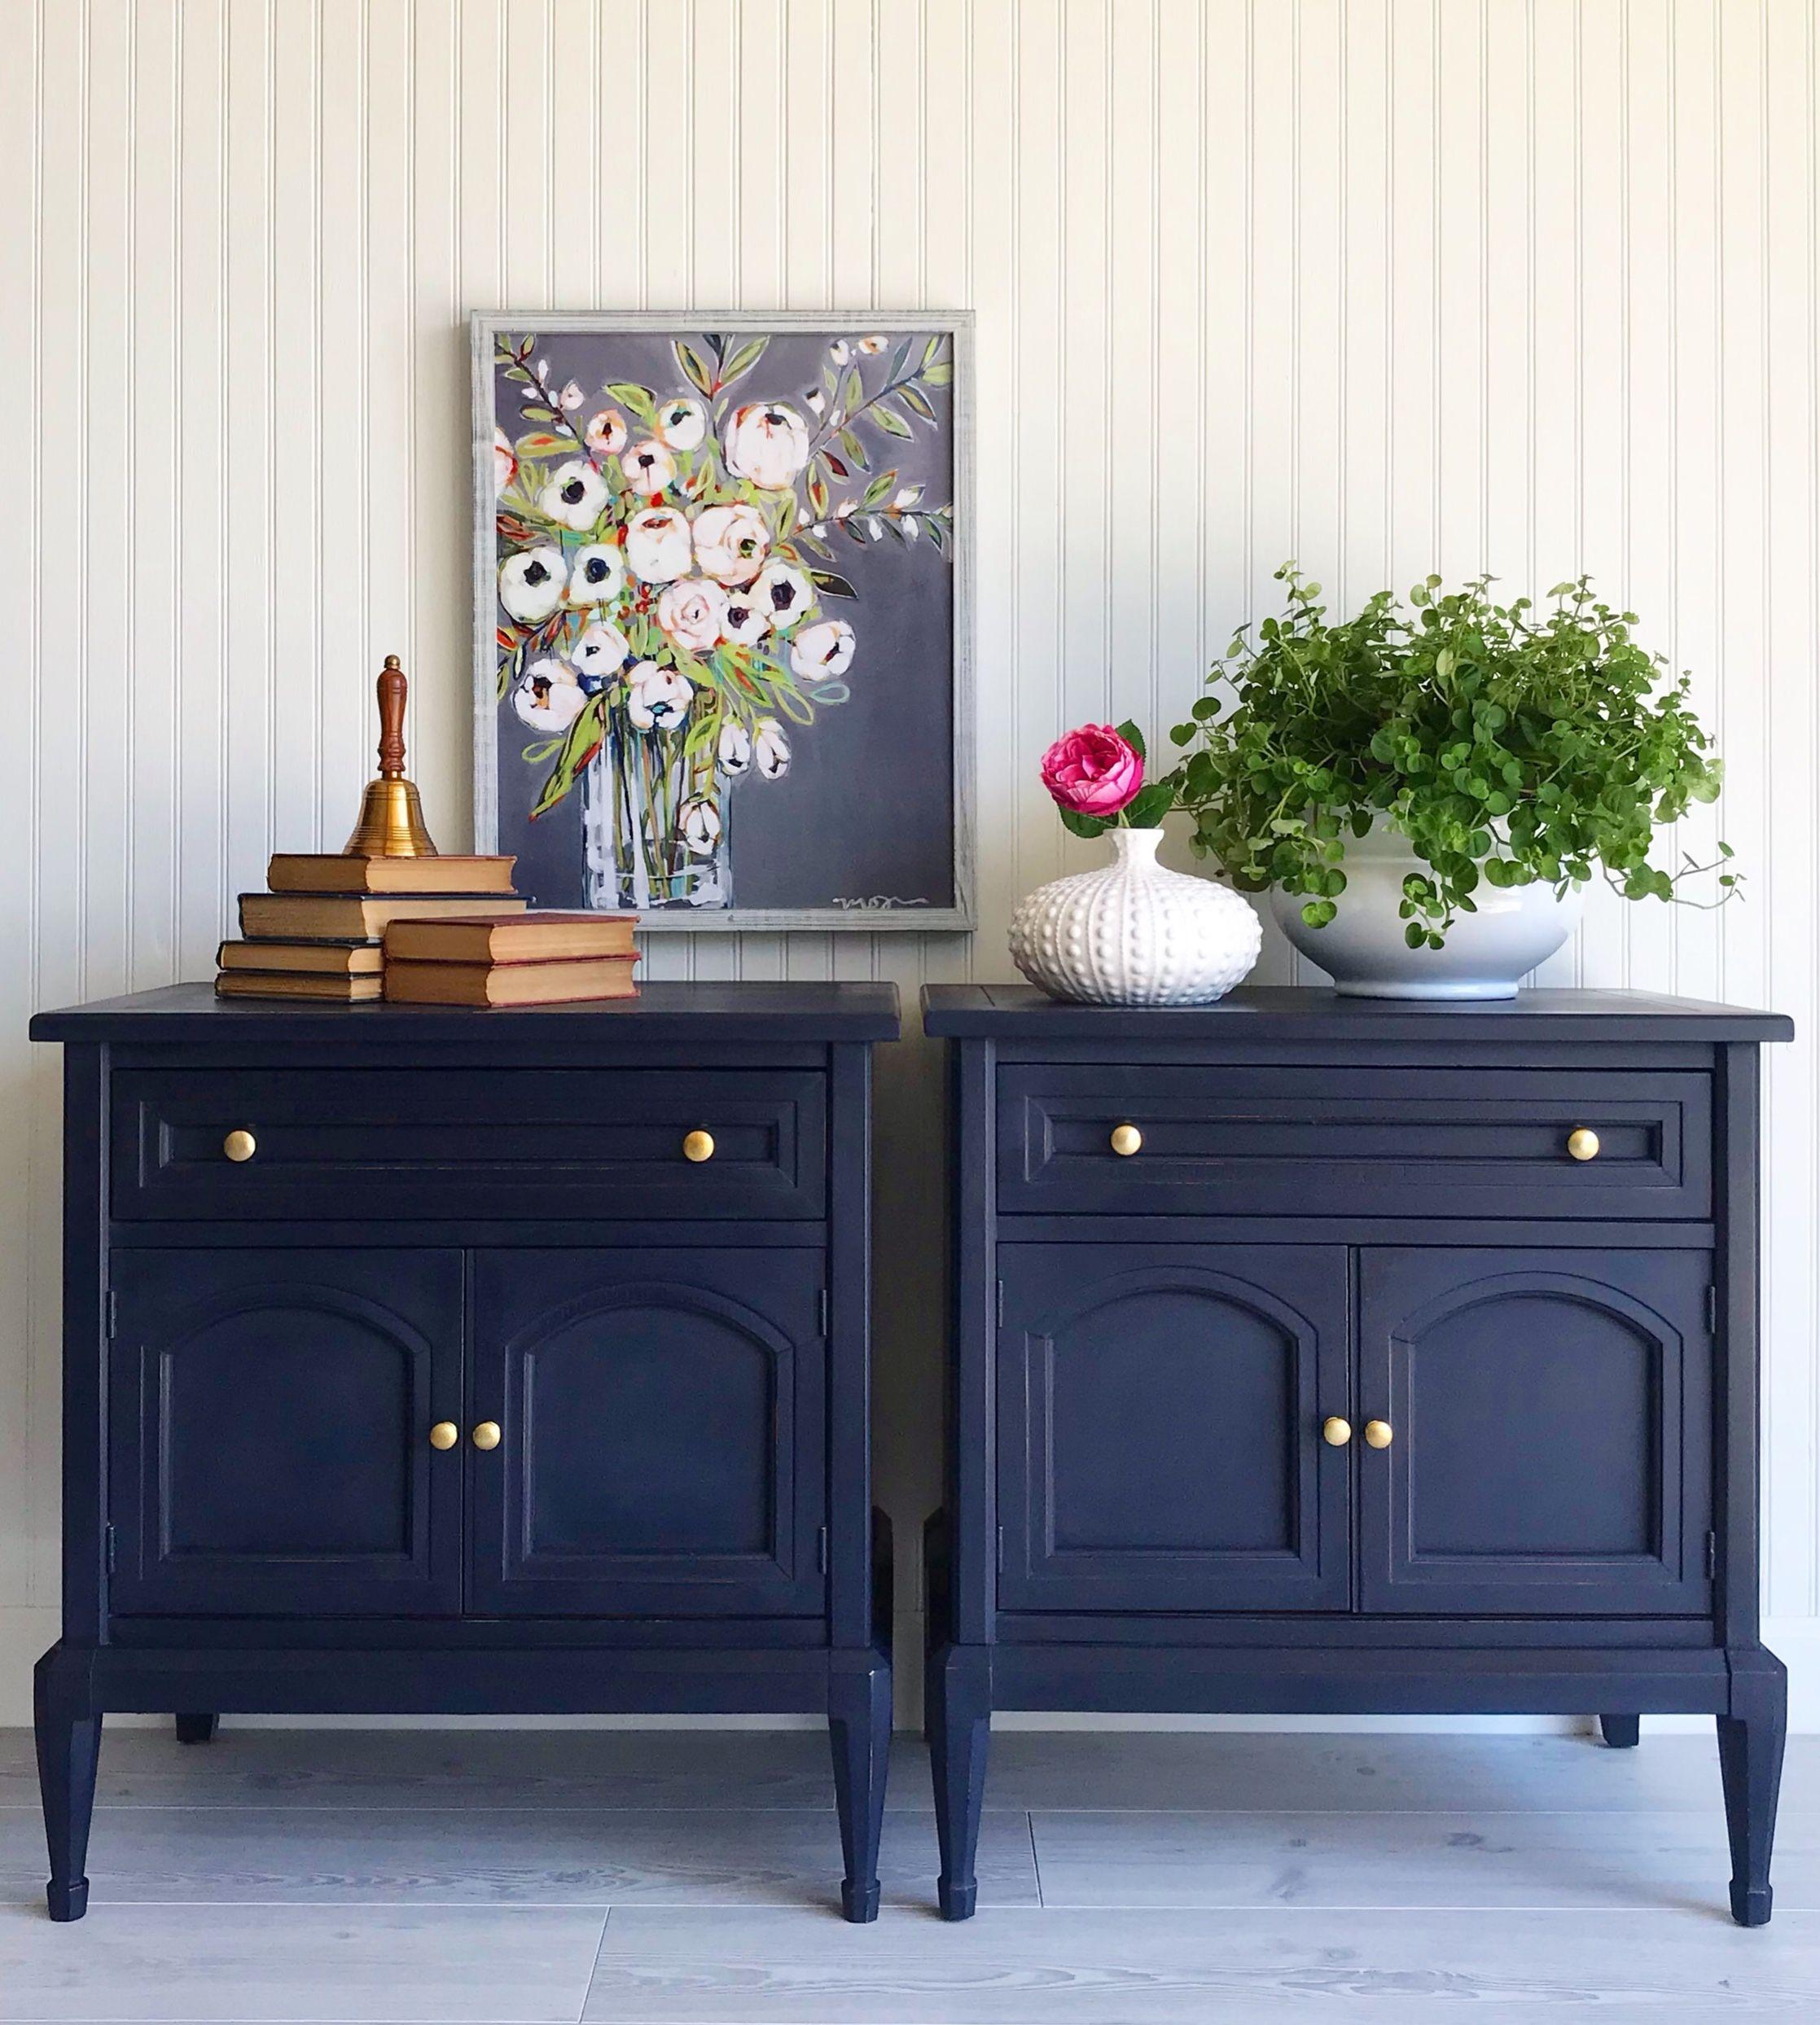 Oxford Navy Chalk Paint Annie Sloan Annie Sloan Painted Furniture Annie Sloan Furniture Painted Furniture Colors